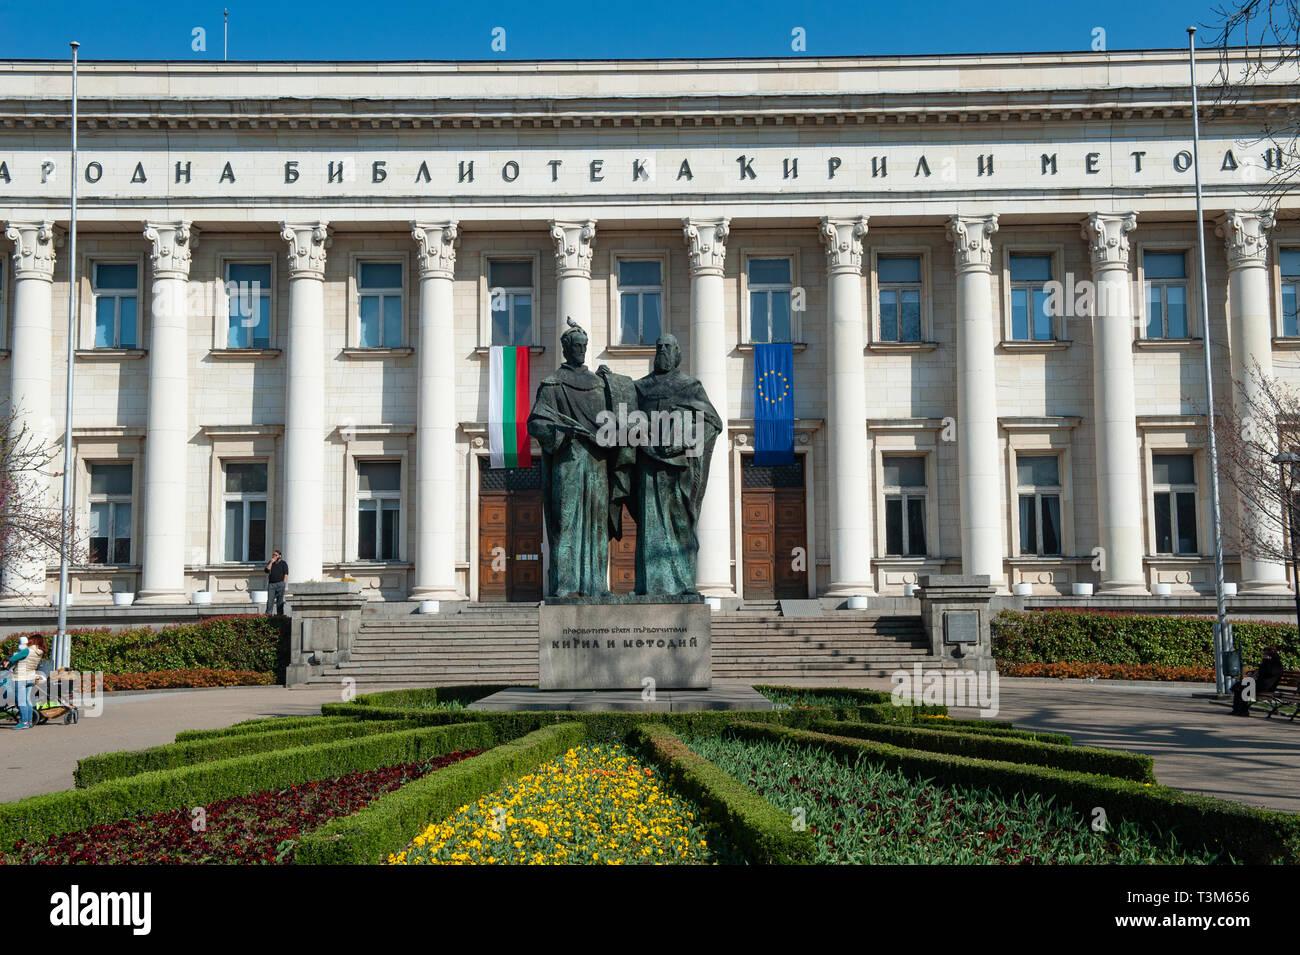 The National Library, Sofia, Bulgaria, Europe - Stock Image